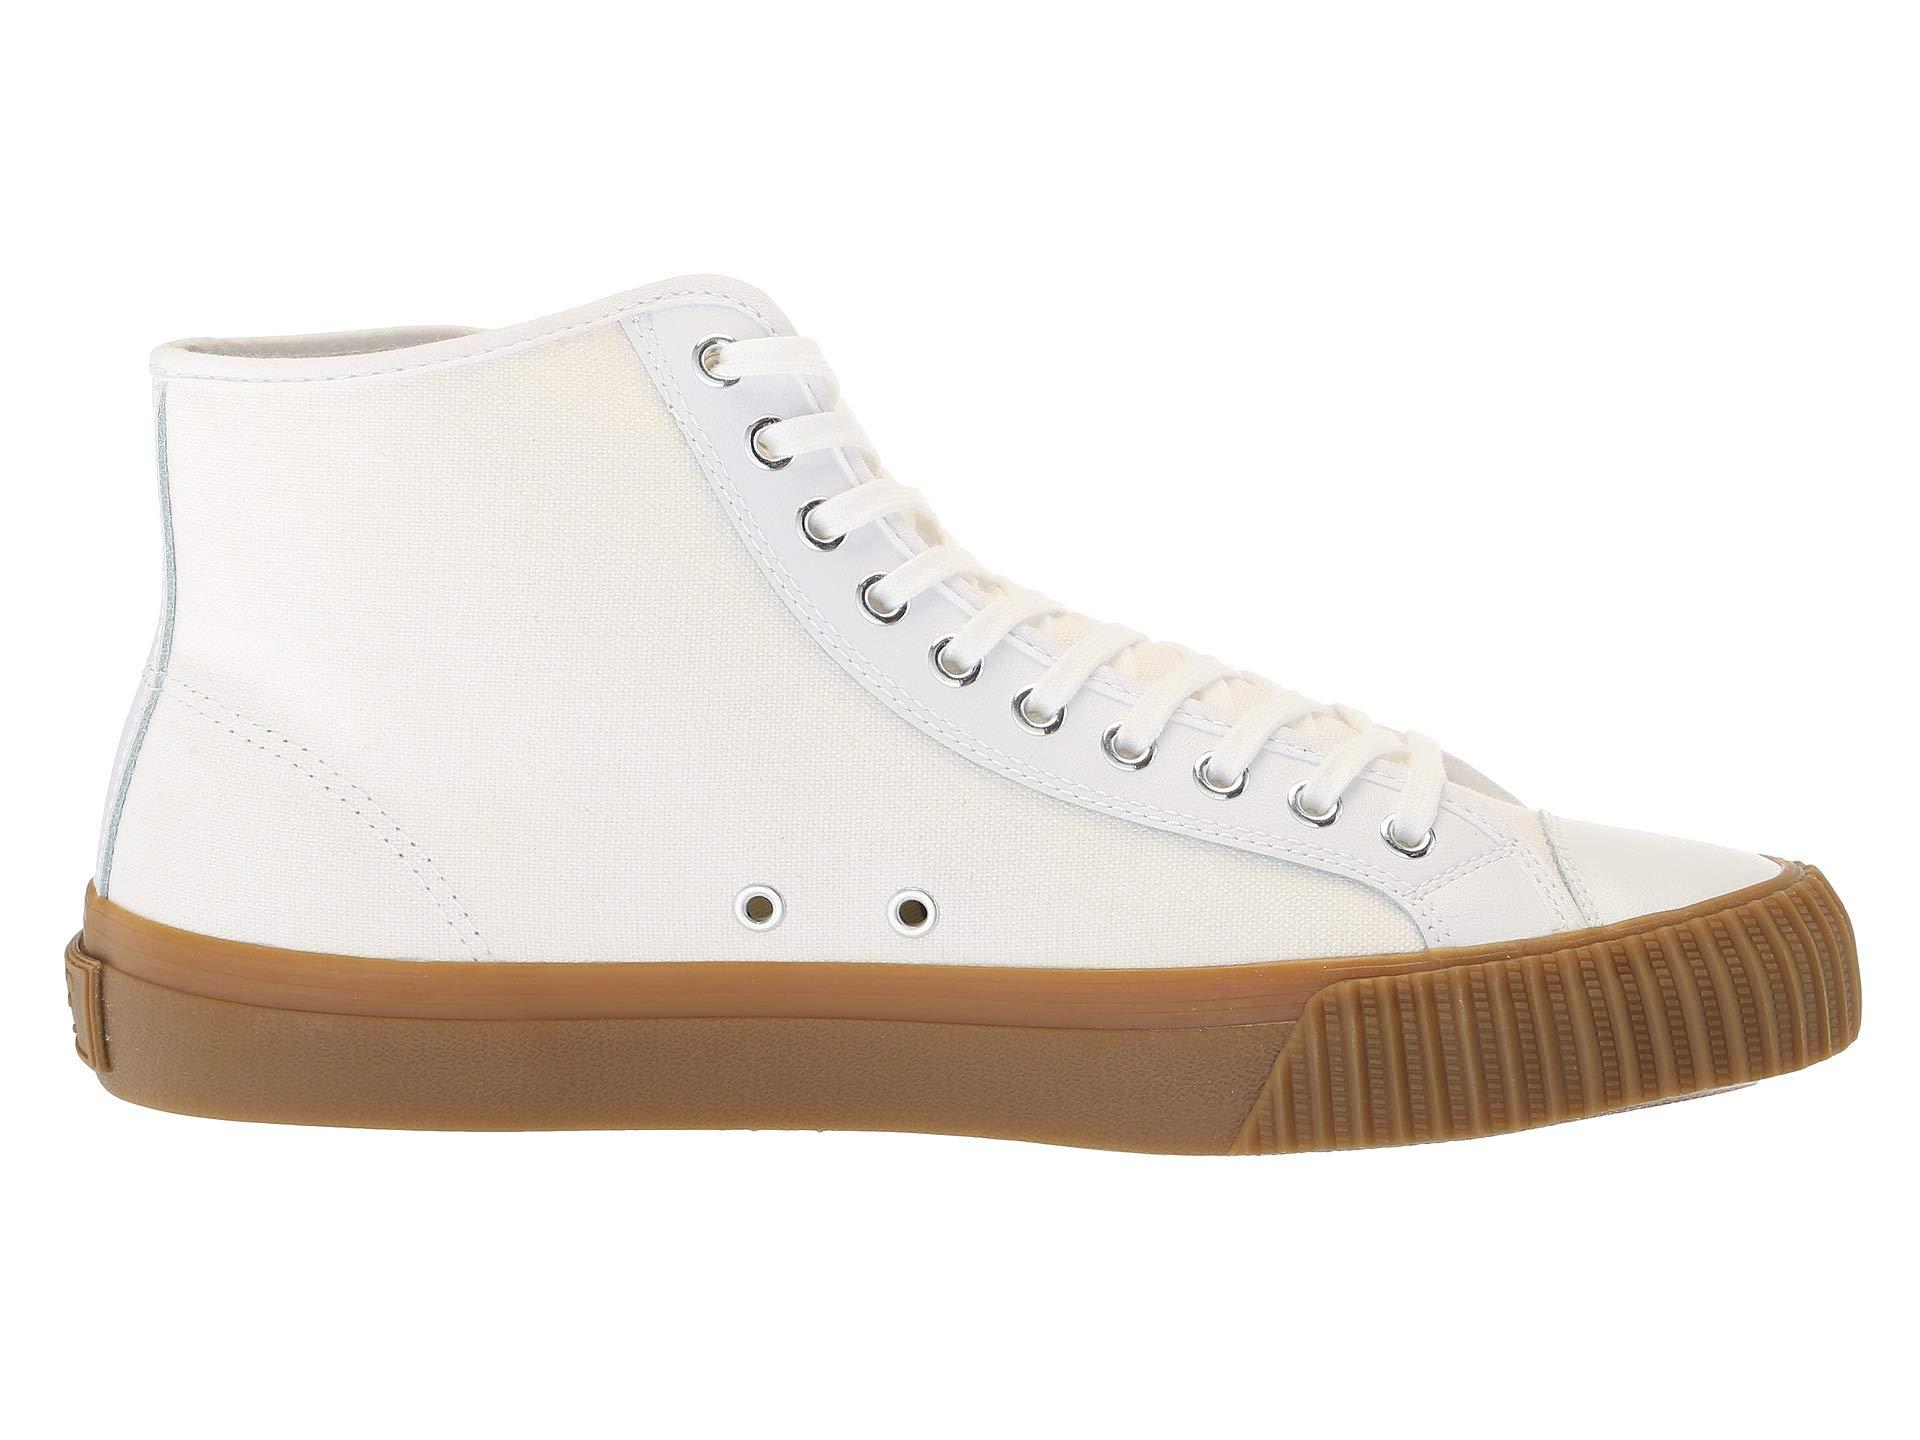 leather White Center Canvas Flyers Hi Pf qwgPnxHv1